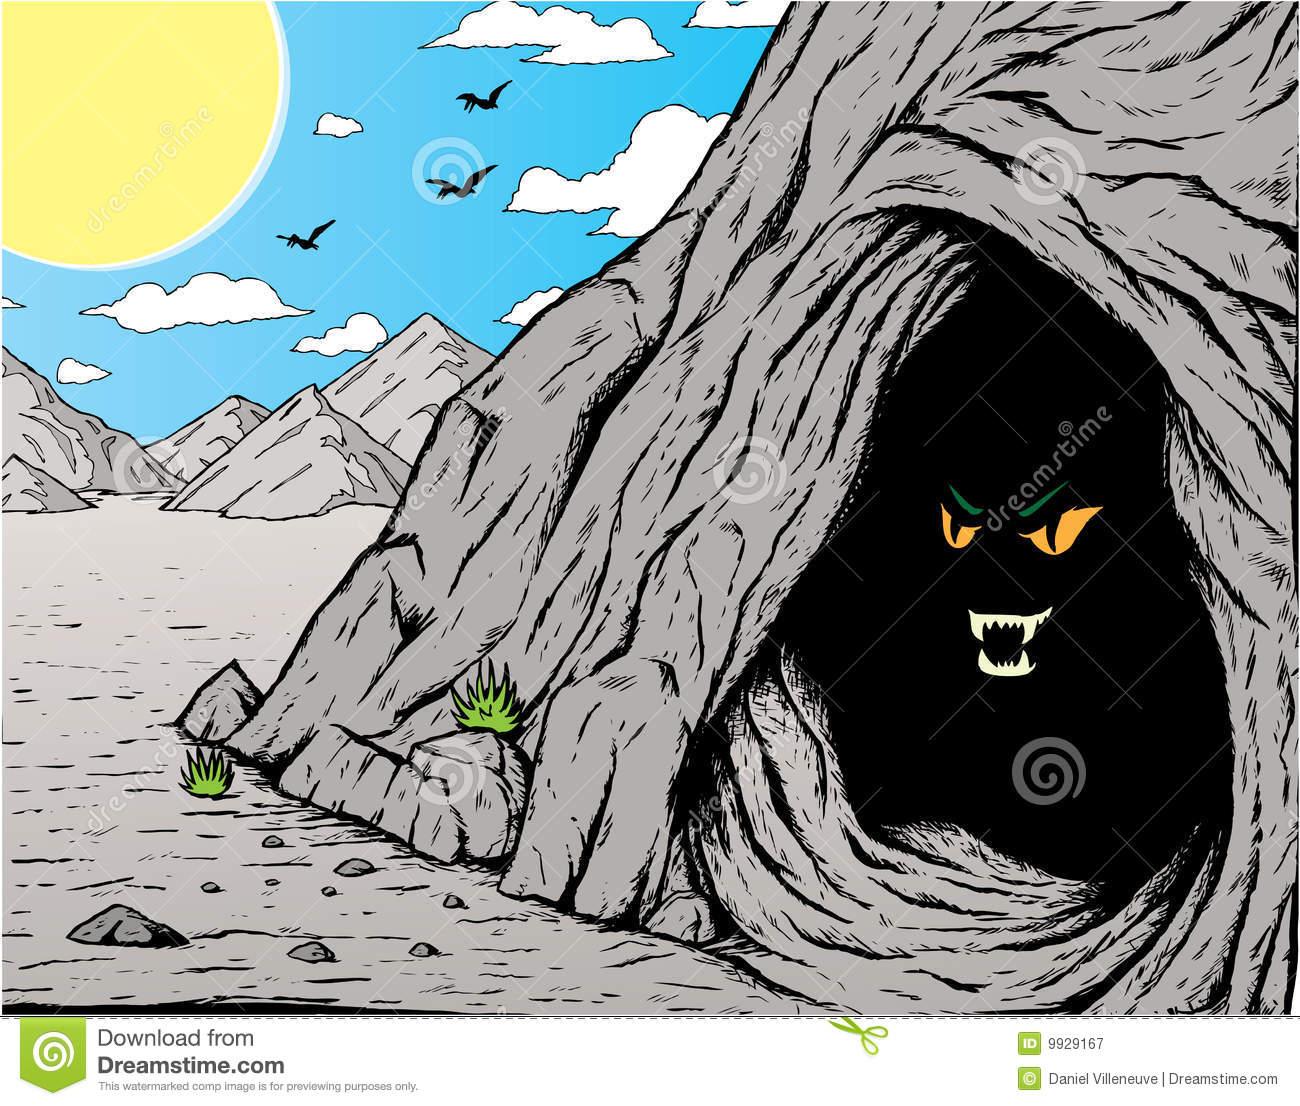 Drawn cavern vector Cavern Cavern clipart Download Cavern